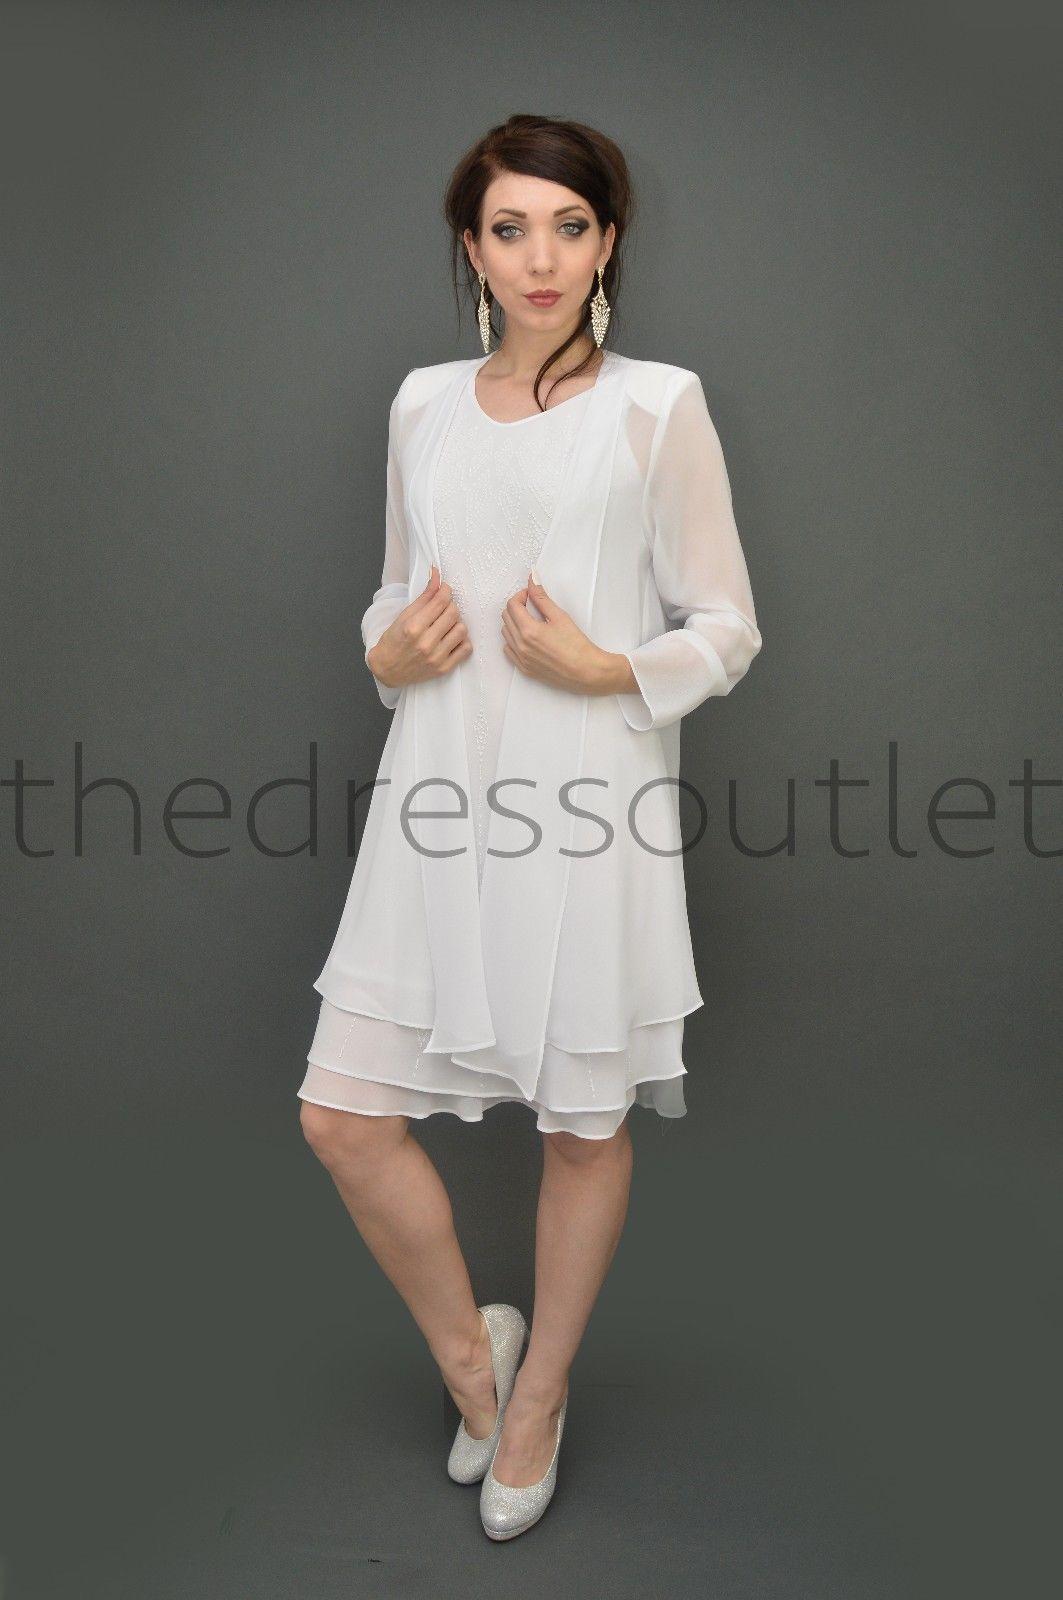 Awesome awesome thedressoutlet short mother of bride formal dress